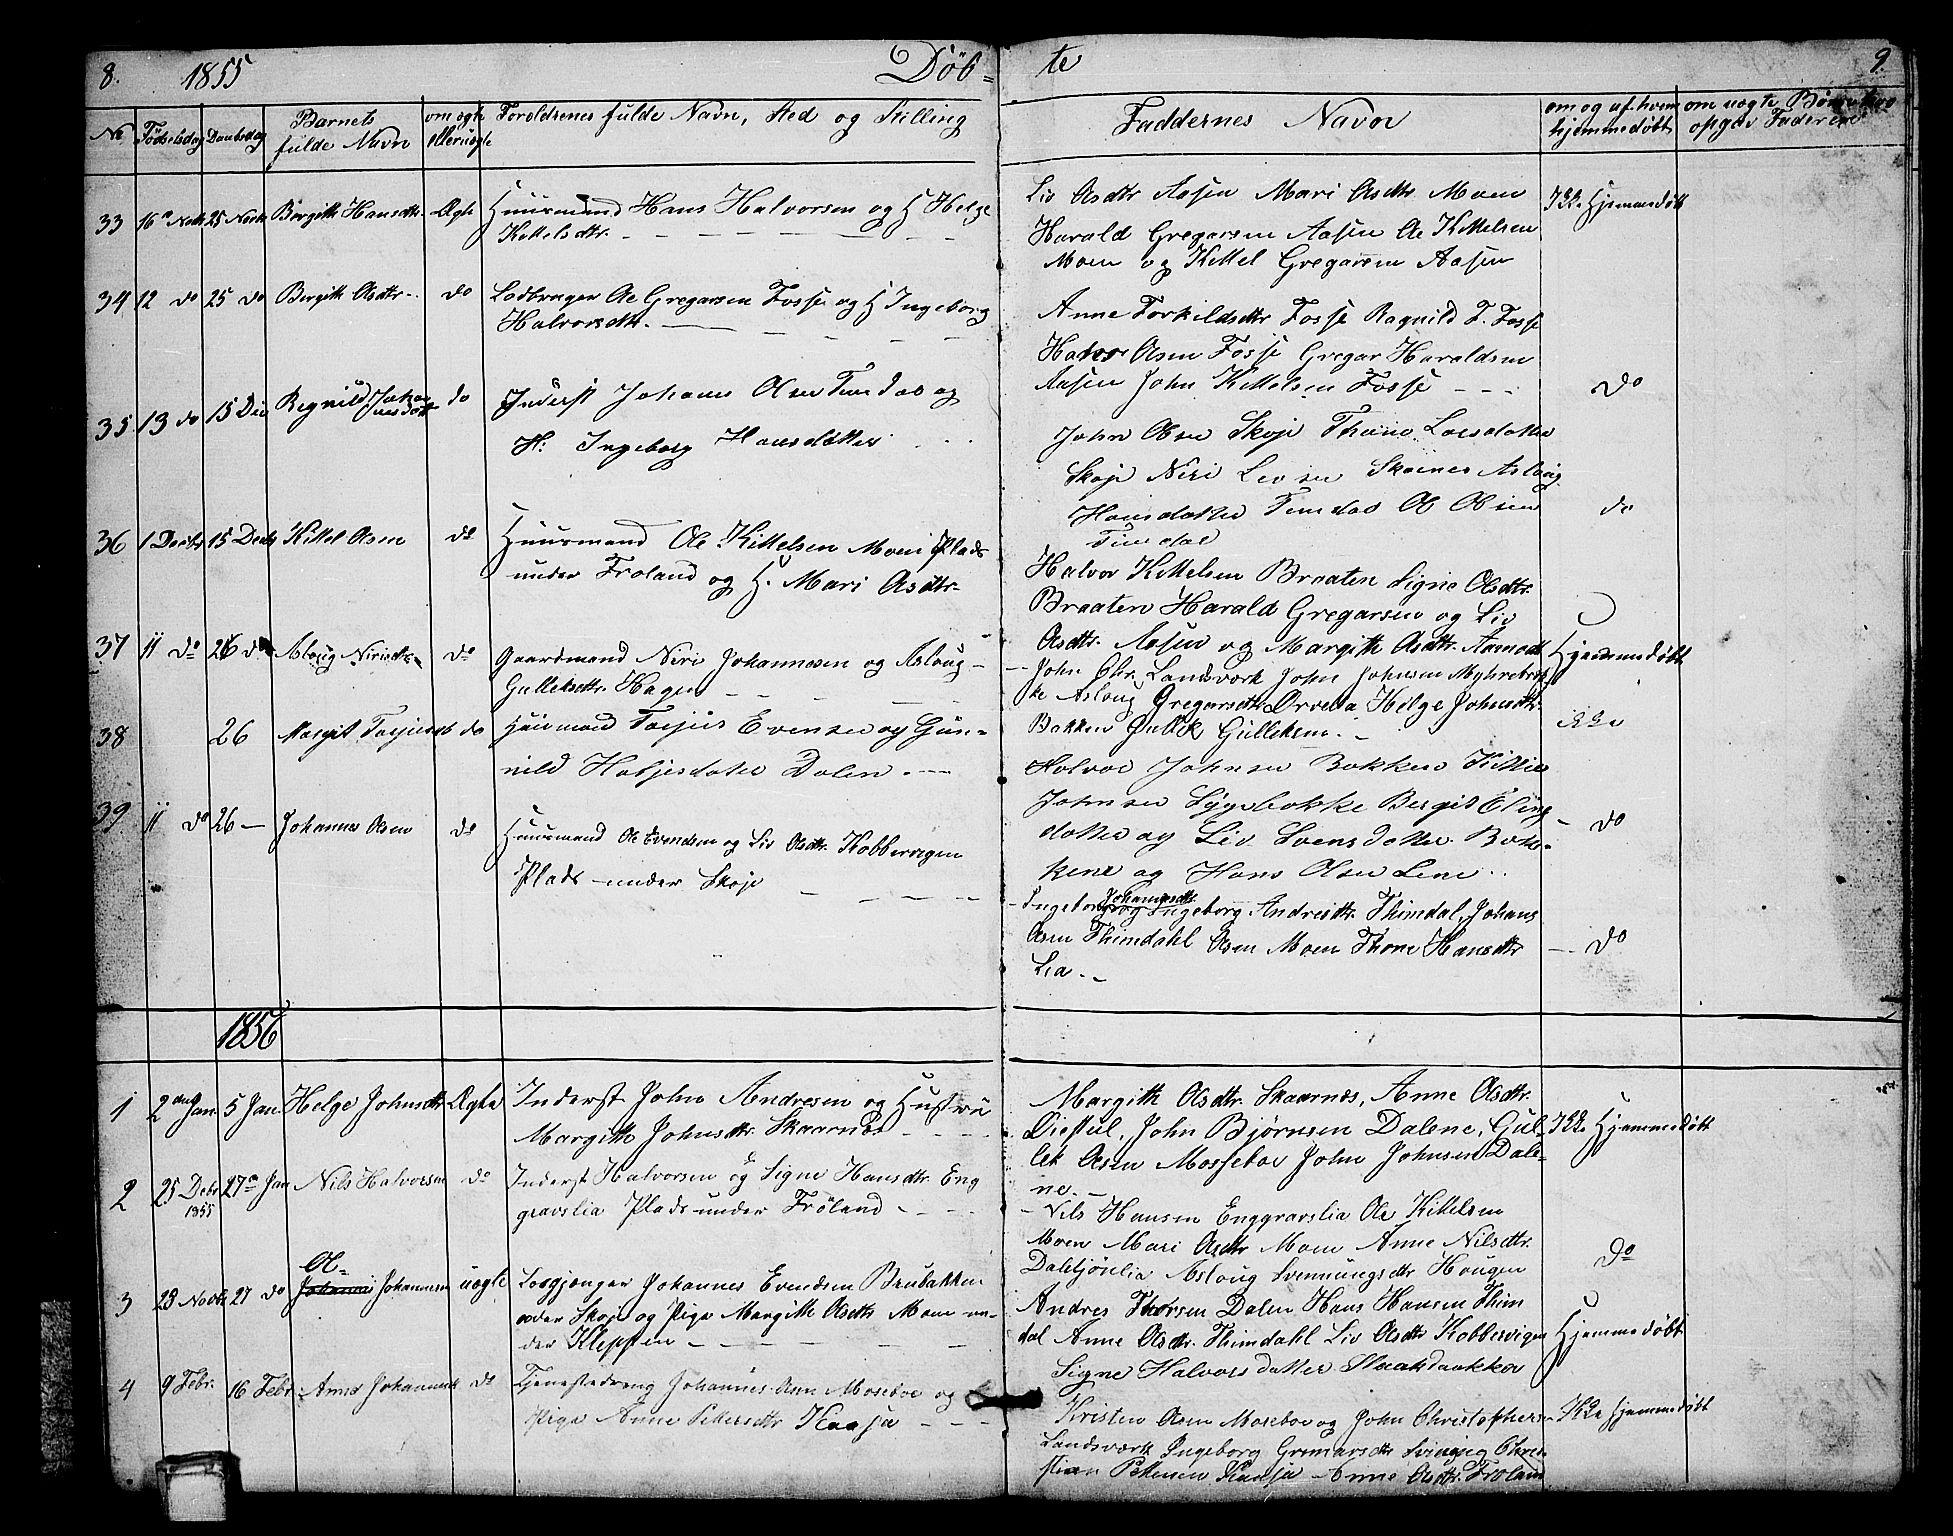 SAKO, Hjartdal kirkebøker, G/Gb/L0002: Klokkerbok nr. II 2, 1854-1884, s. 8-9